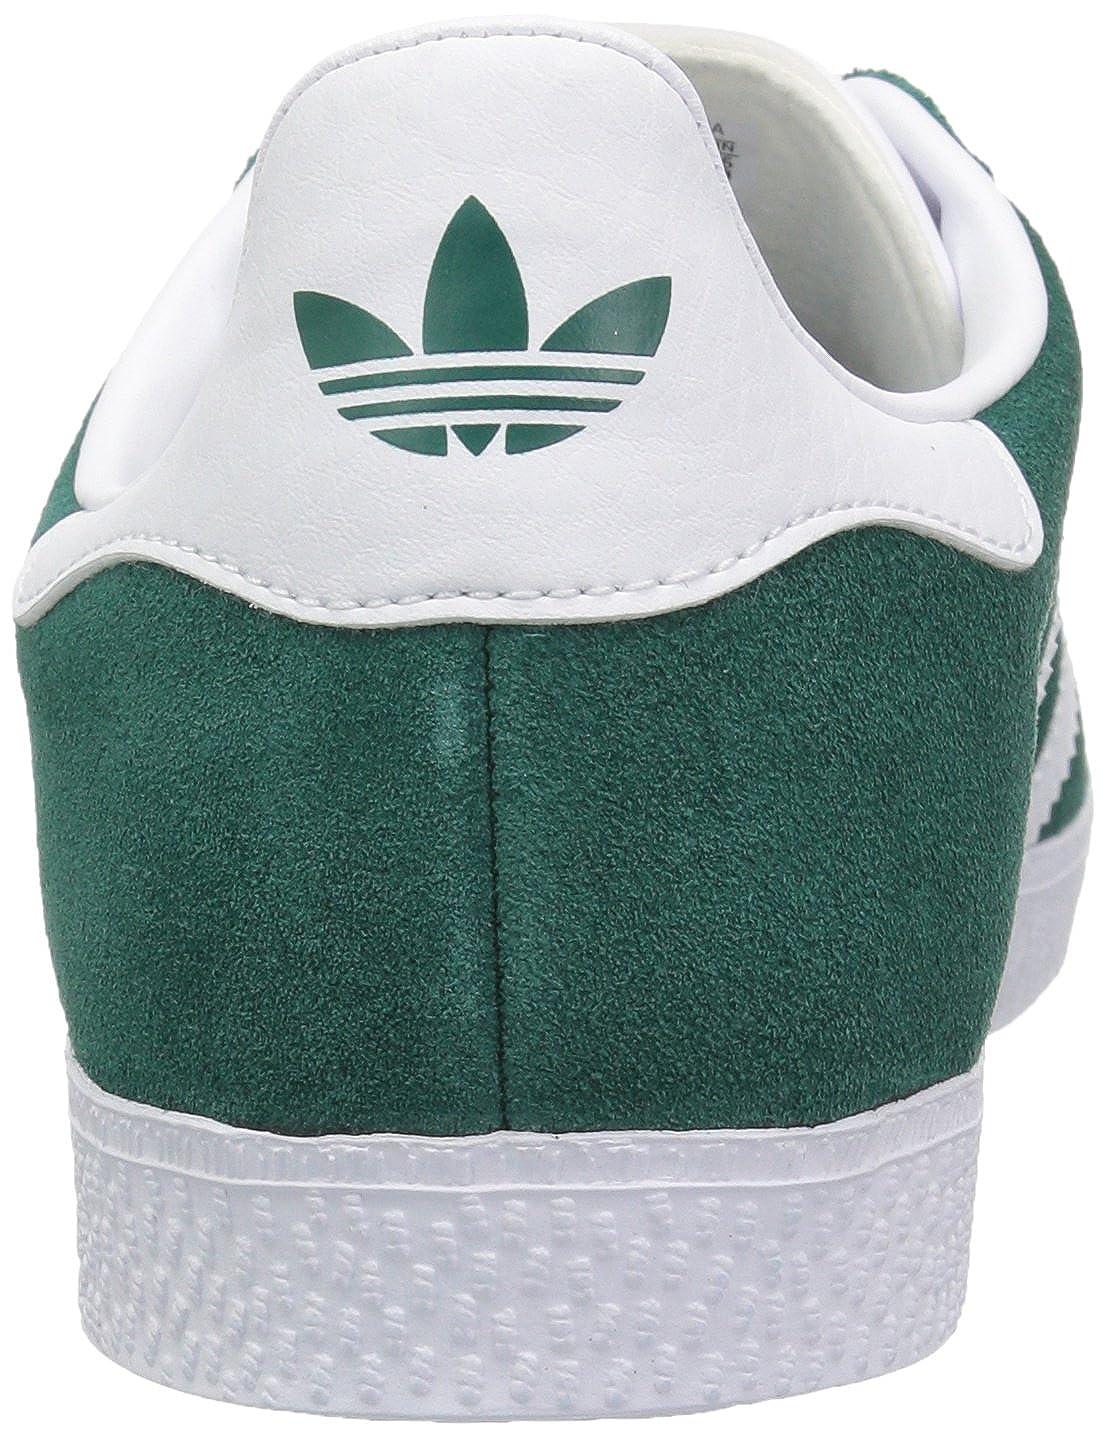 adidas Originals Kids Gazelle J Sneaker